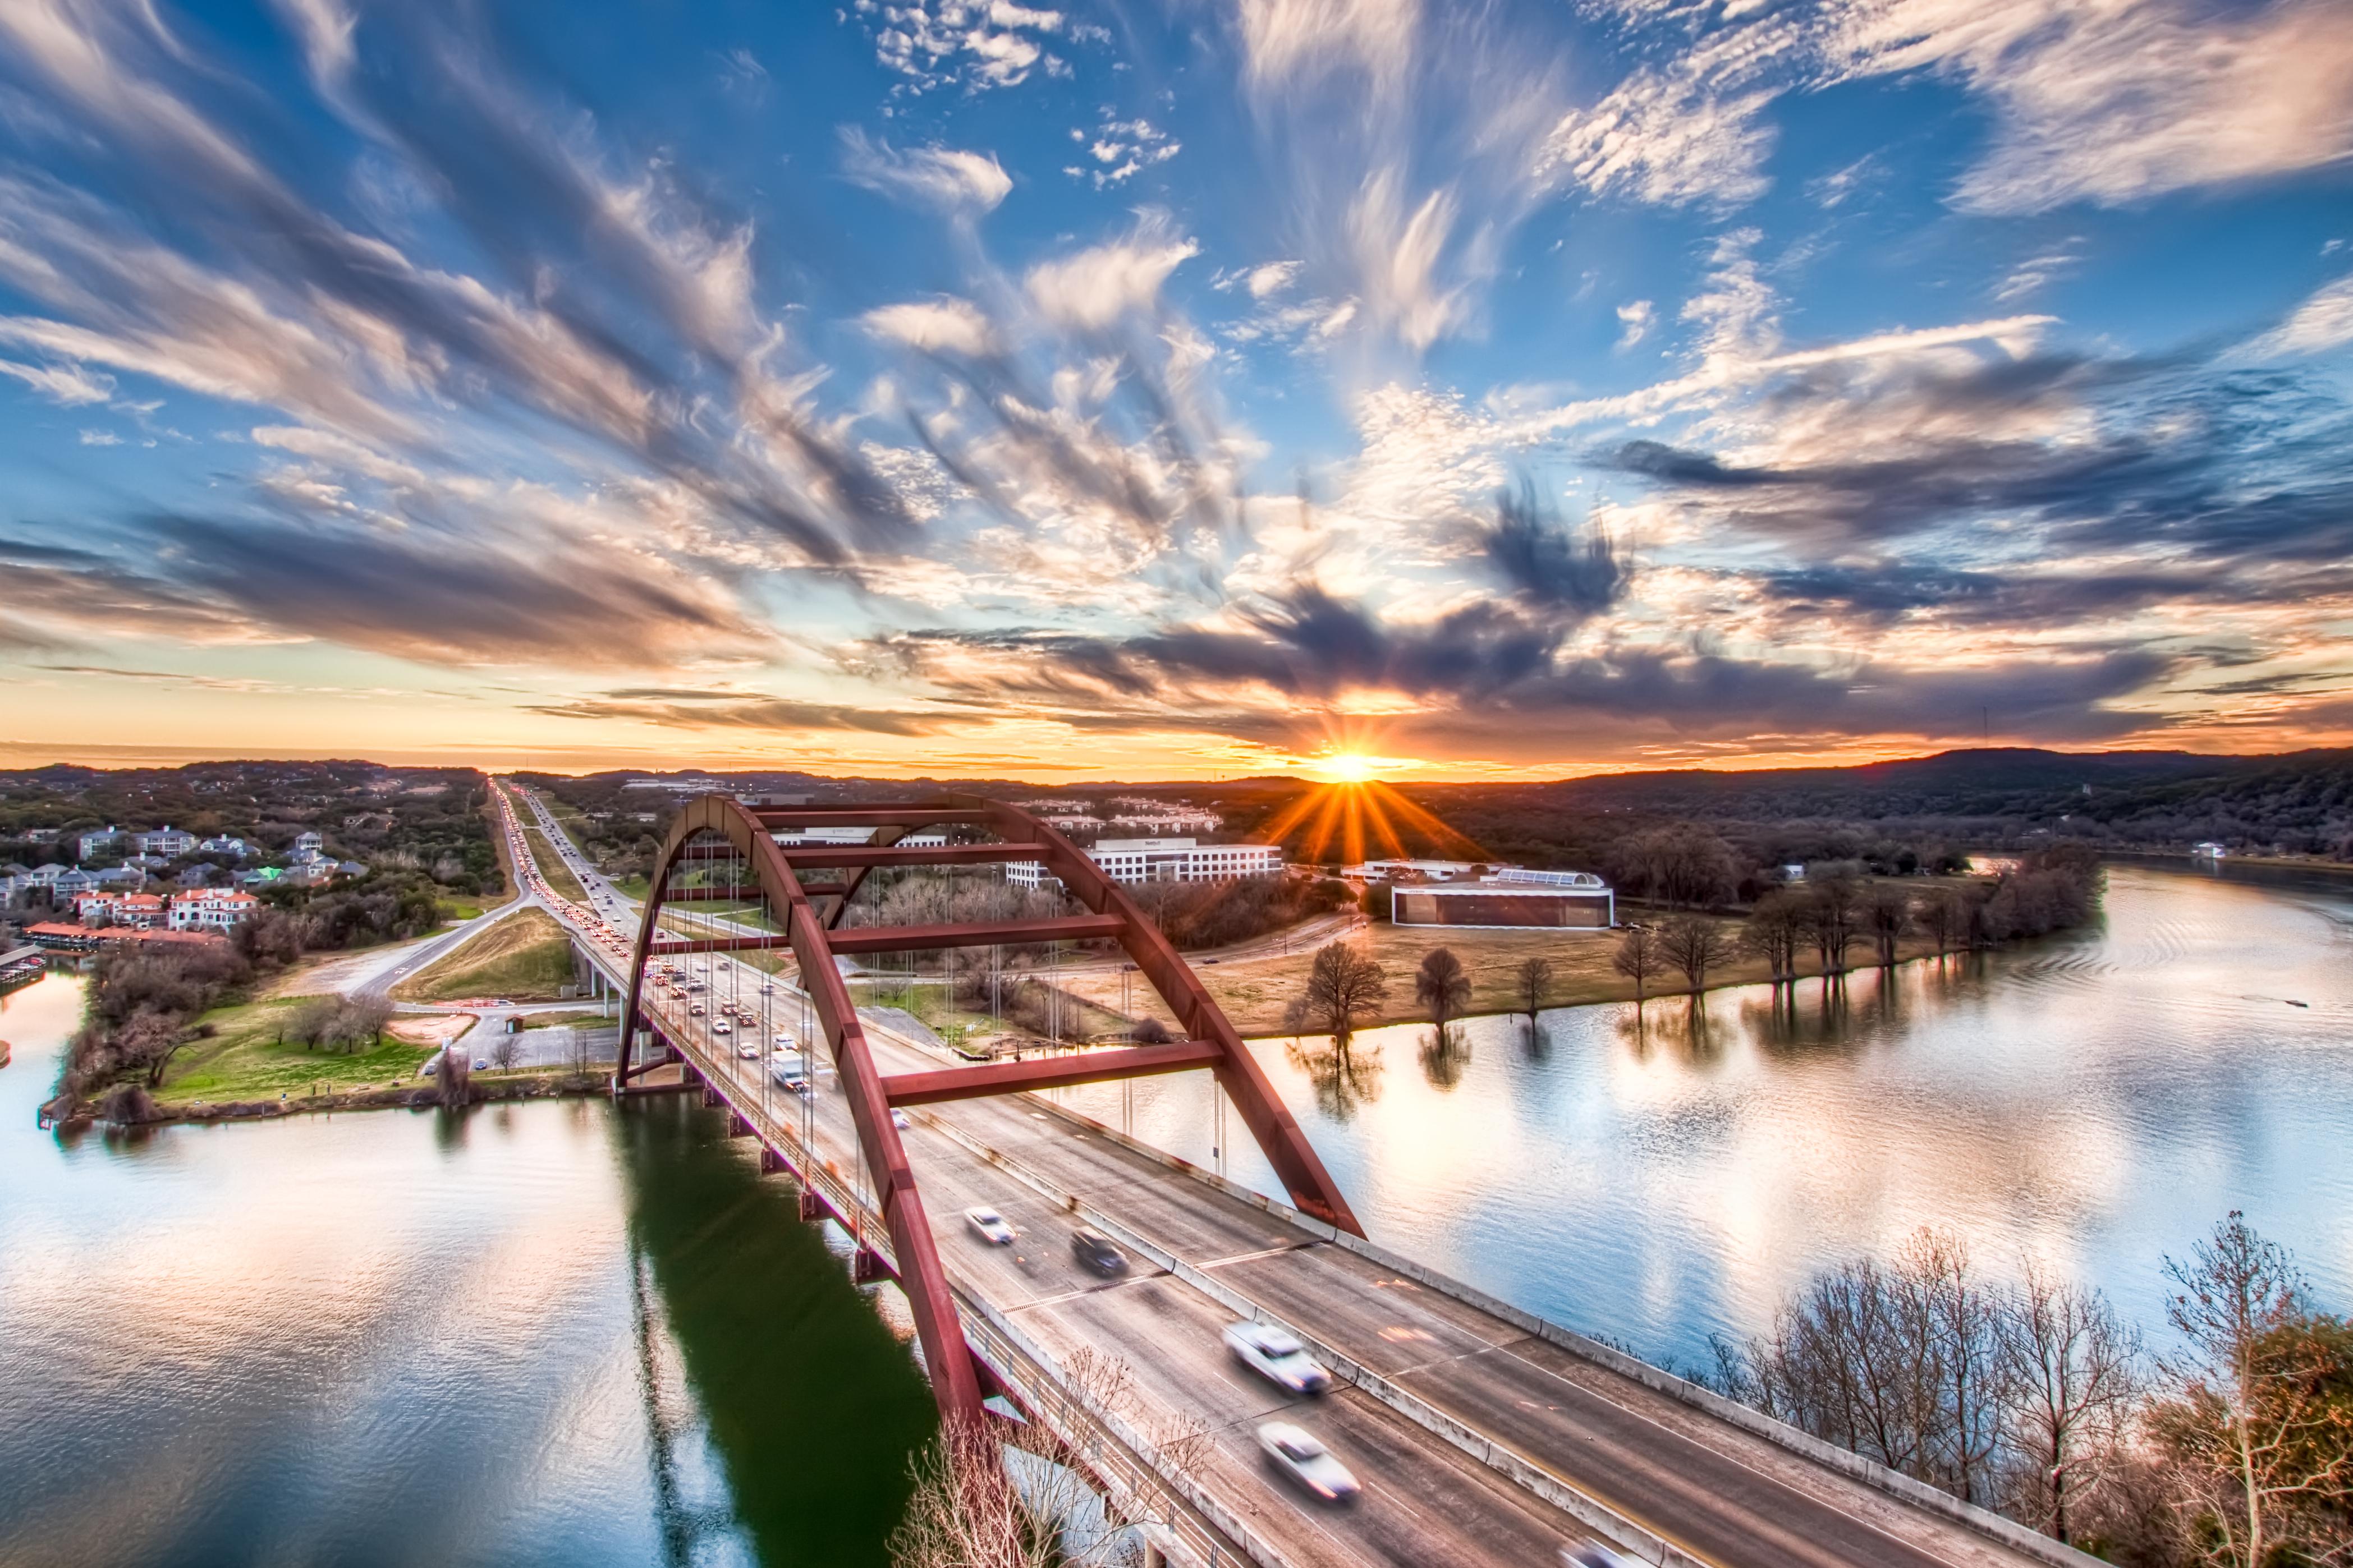 The High Rd, Austin, Tx, Usa Sunrise Sunset Times with regard to Sunrise Sunset Times Austin Texas